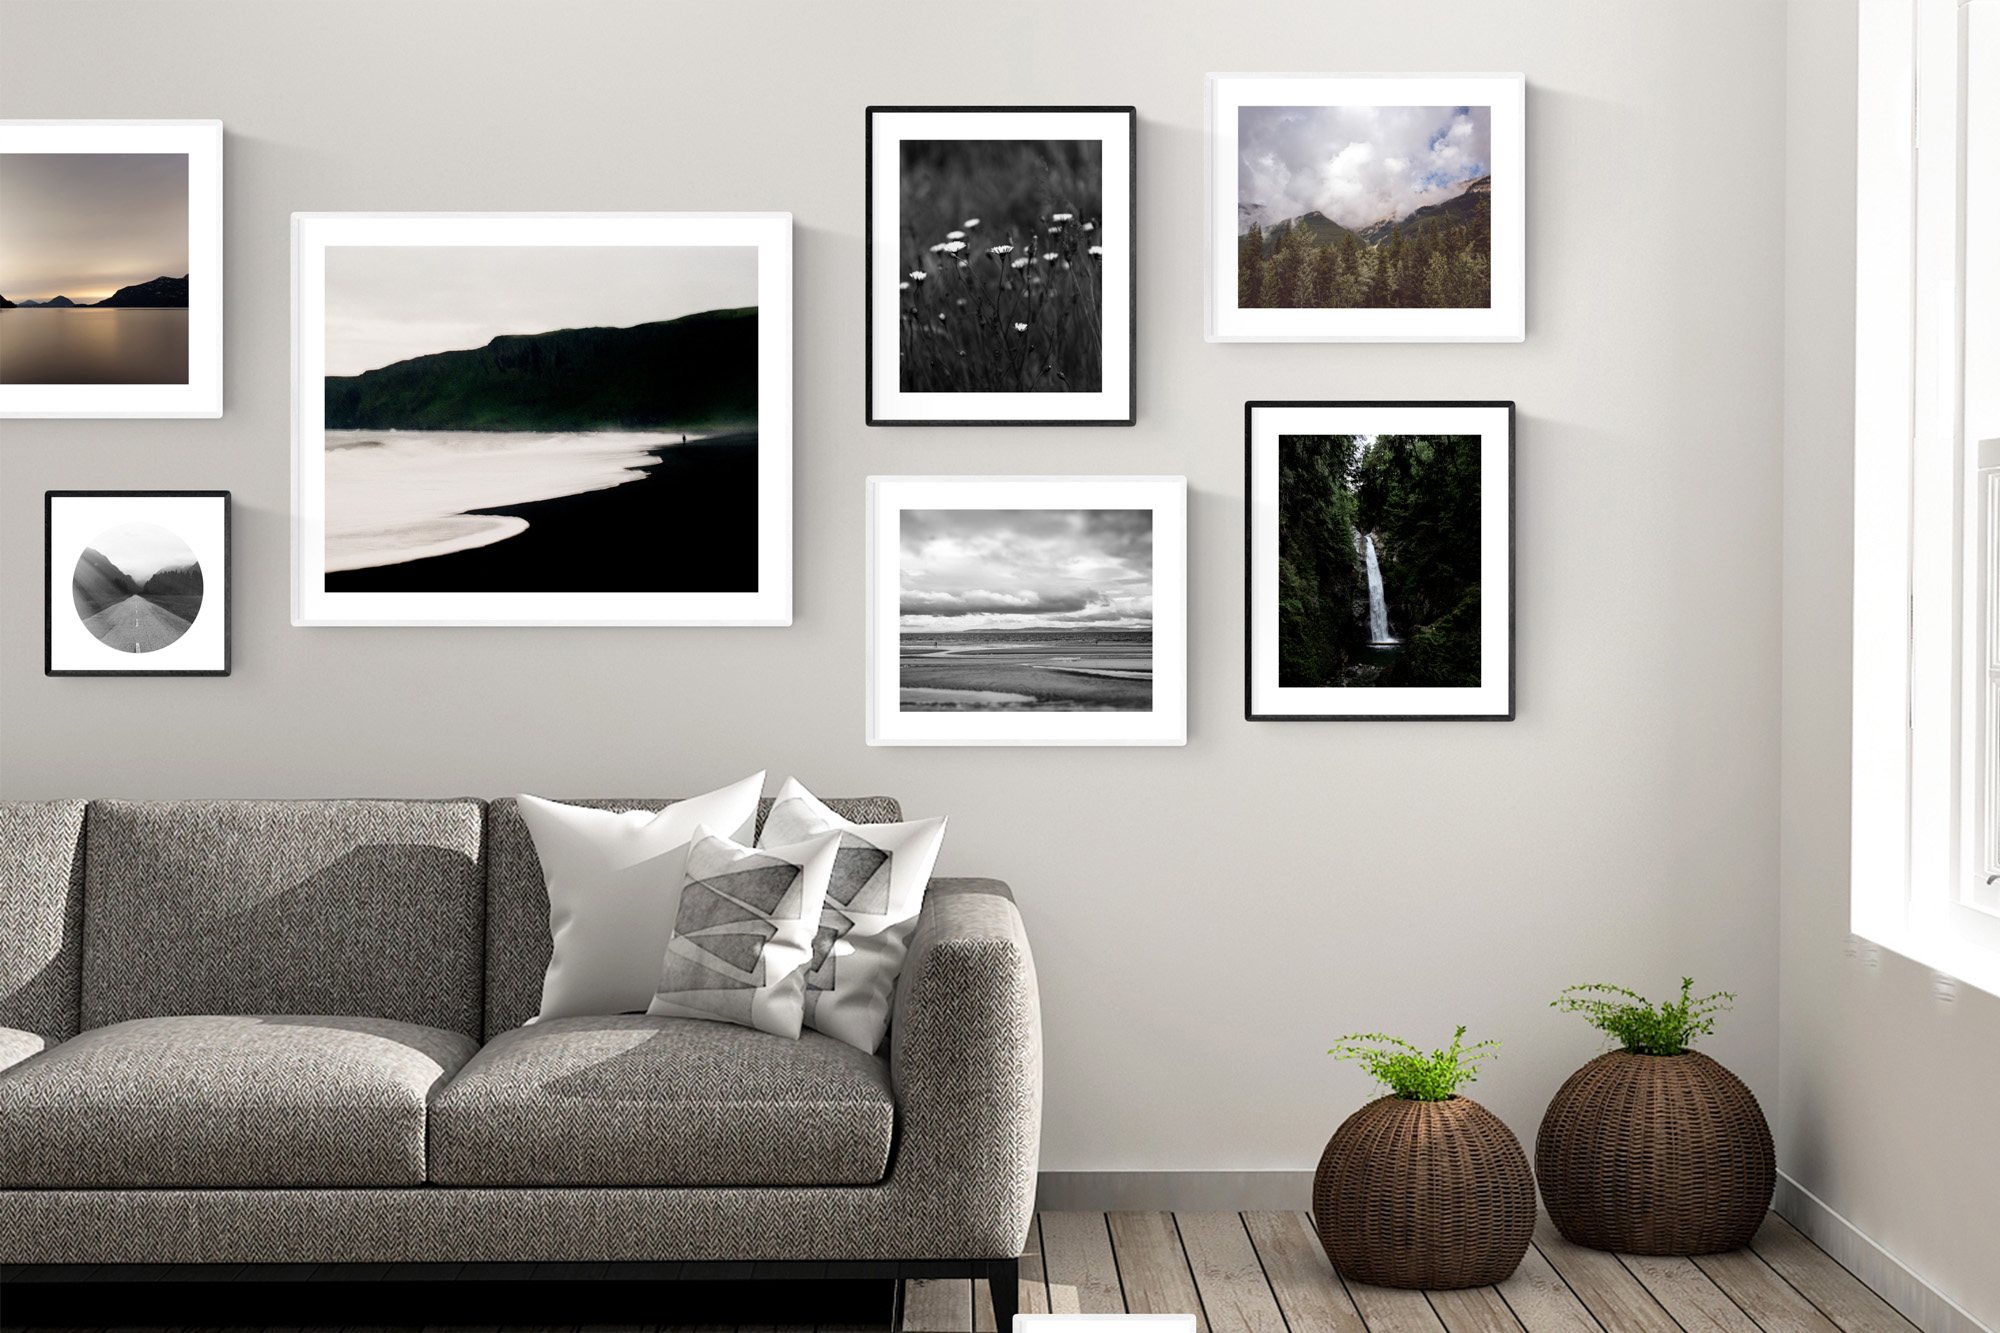 lynann-colligan-photography-prints